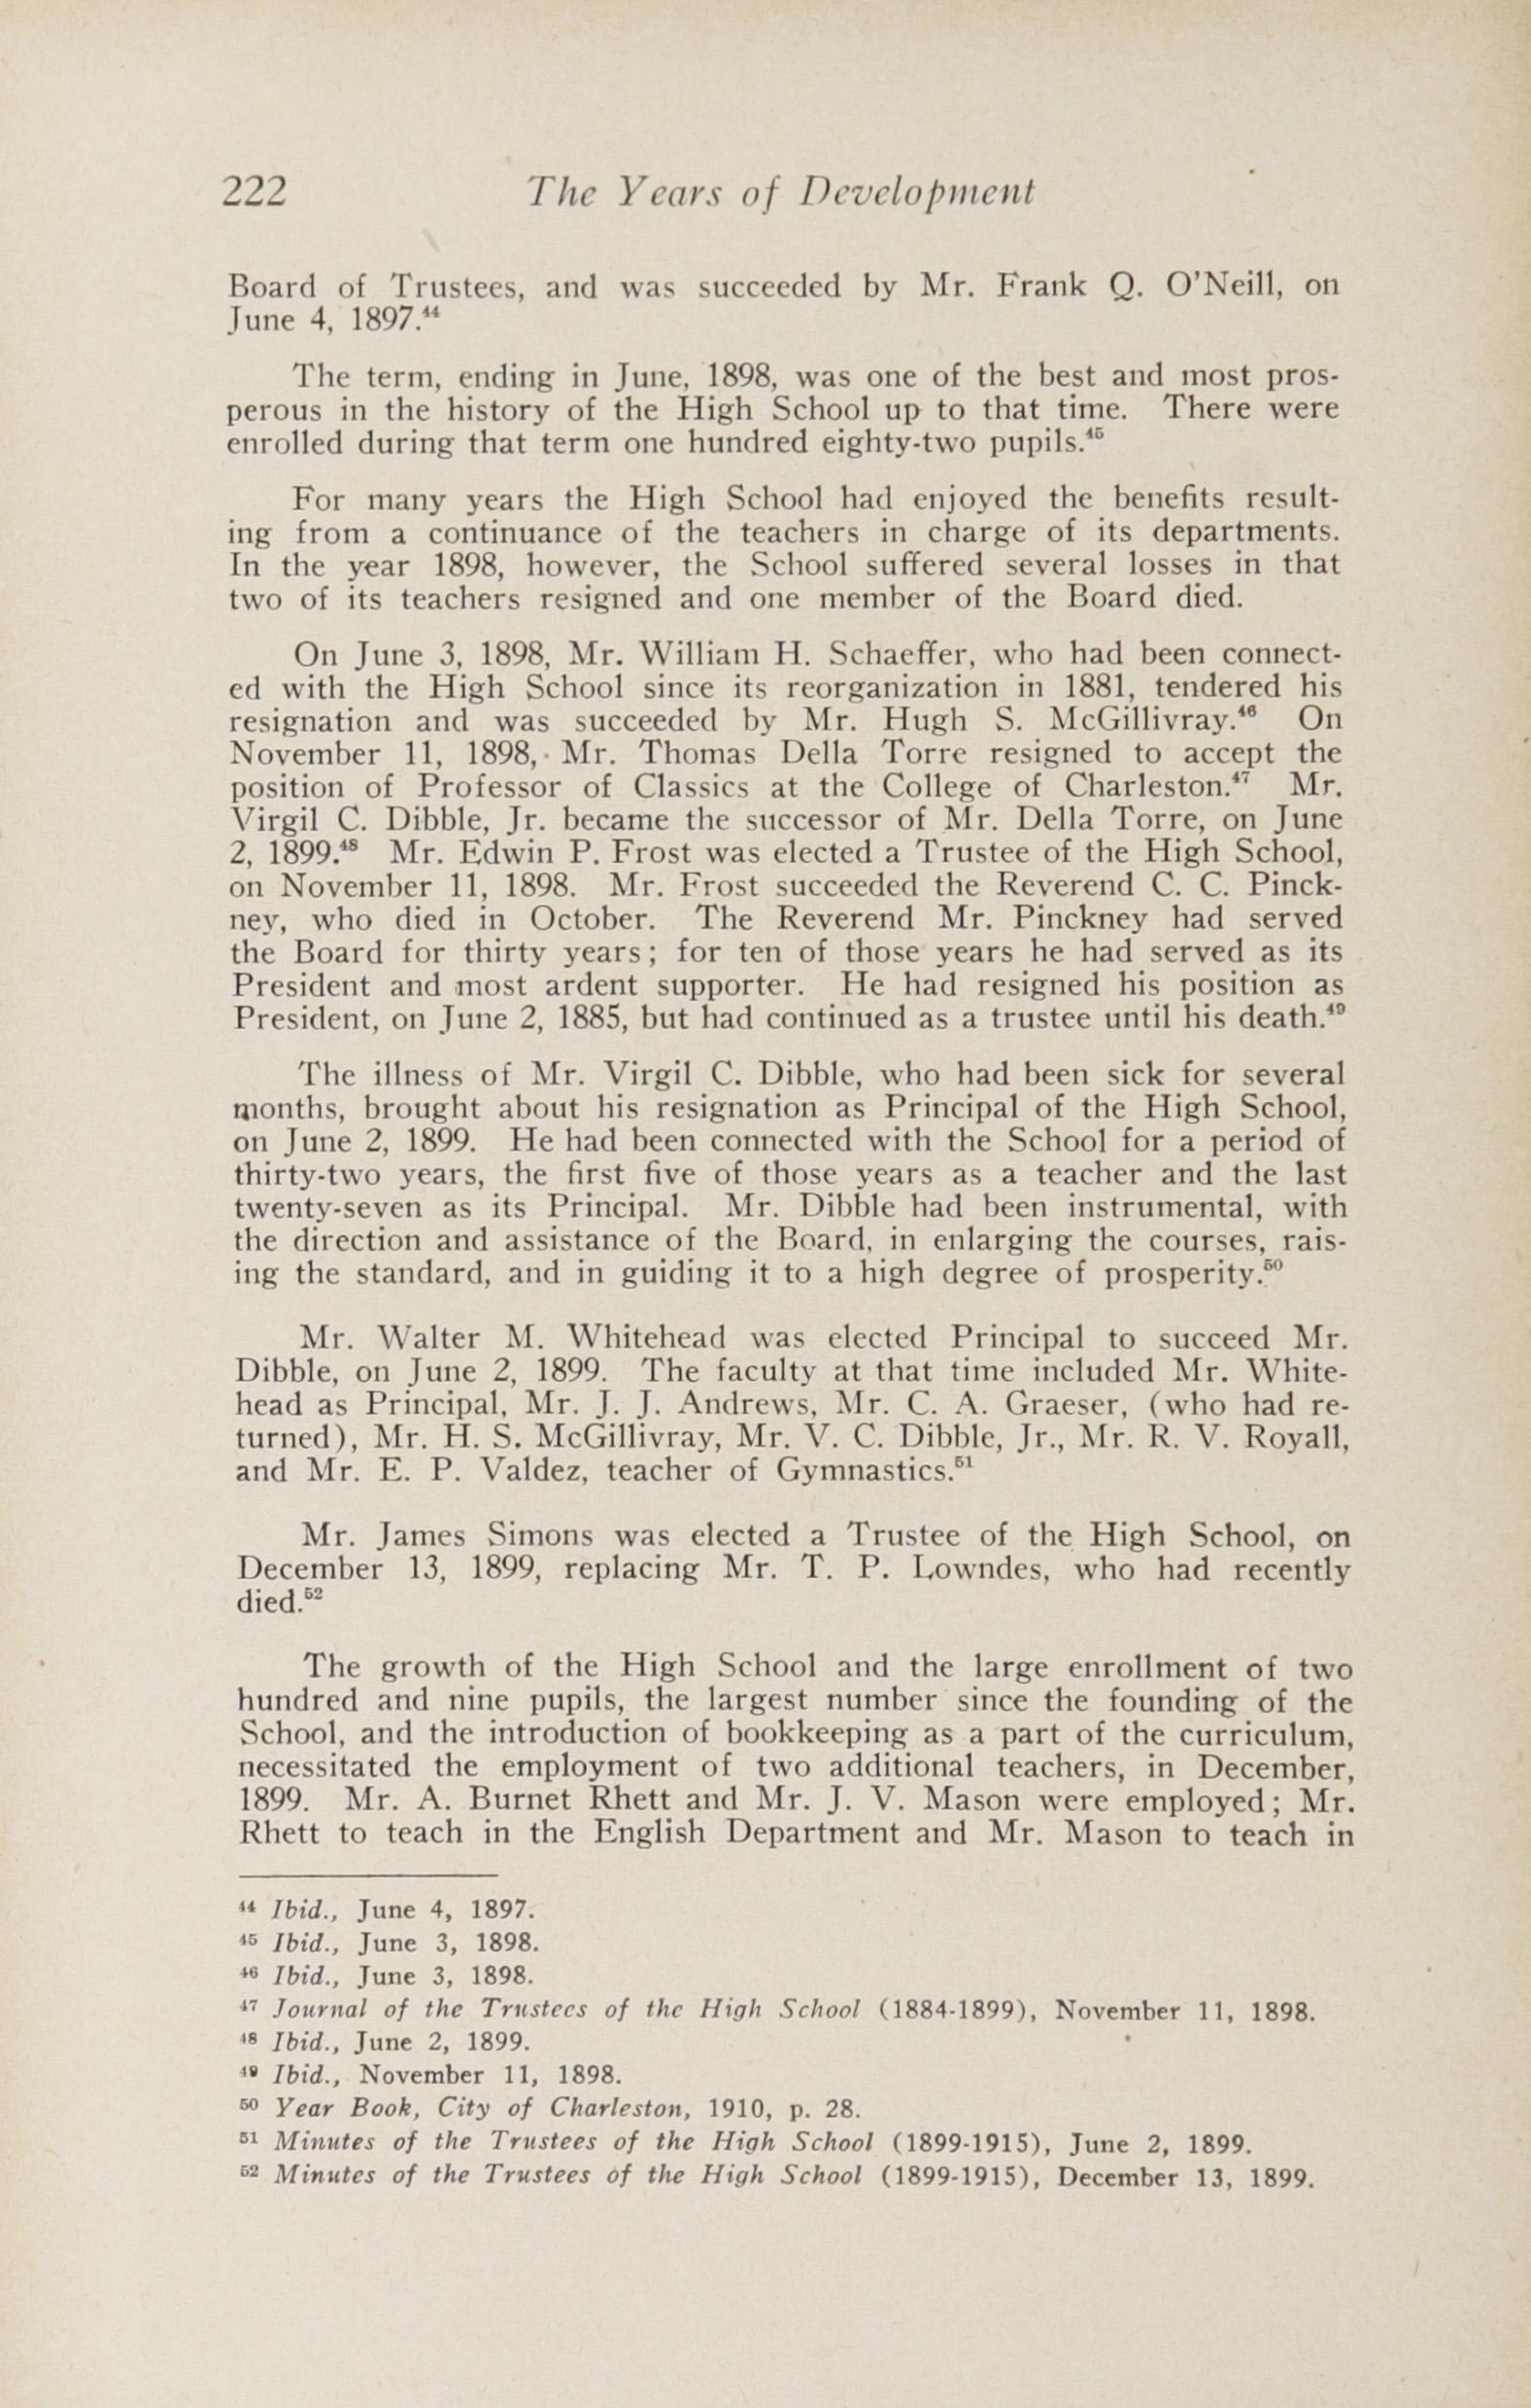 Charleston Yearbook, 1943, page 222